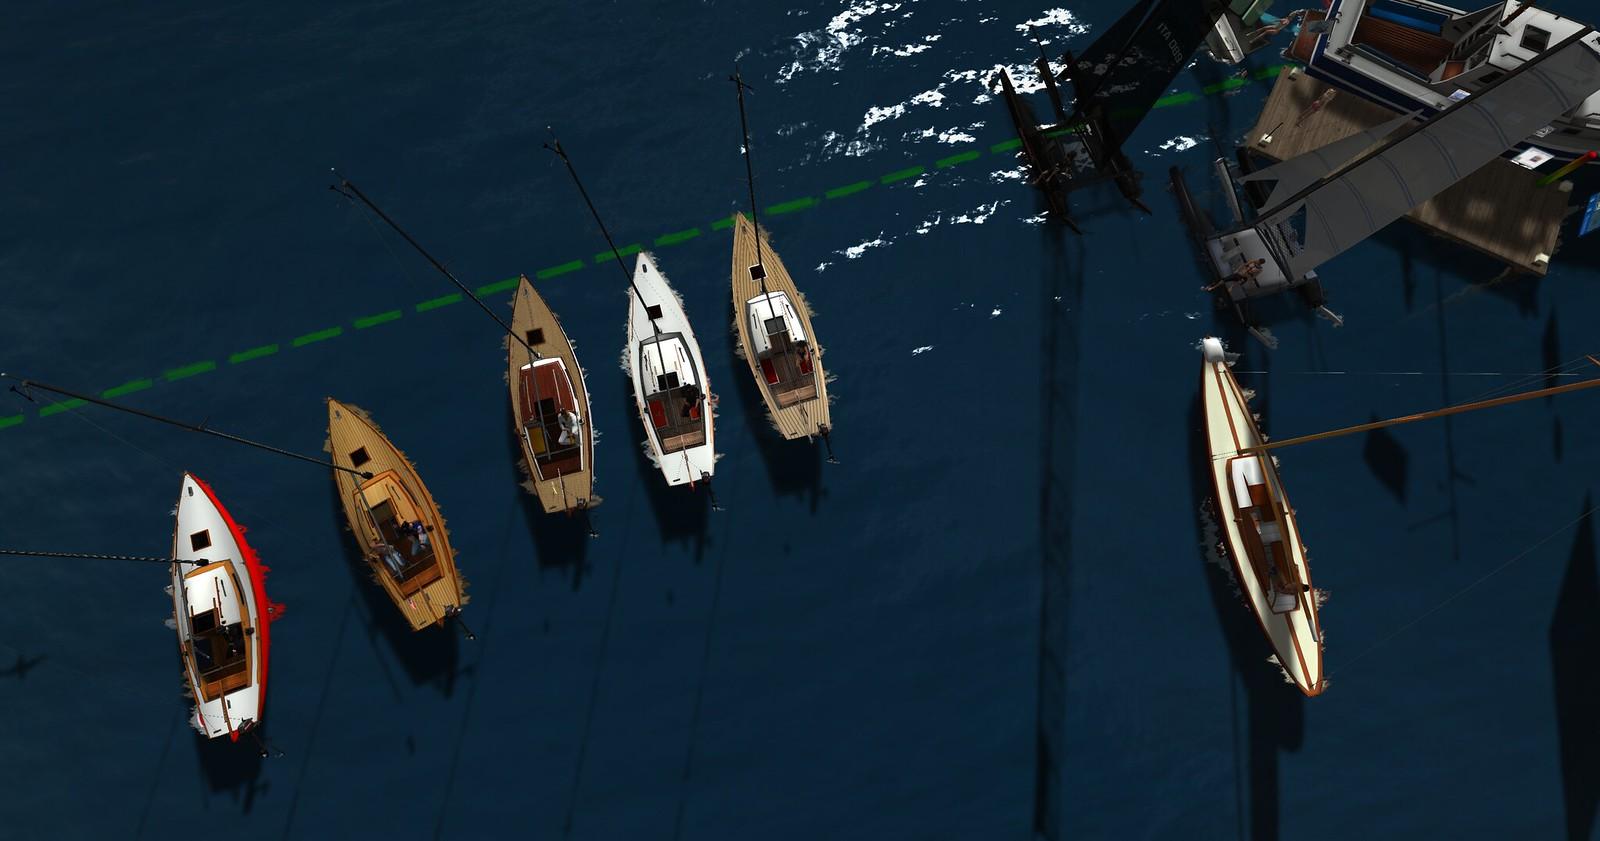 North Sea Open Regatta Small Boat Skipper's Meeting 08/17/16 - Courtesy of Cranston Yordstorm